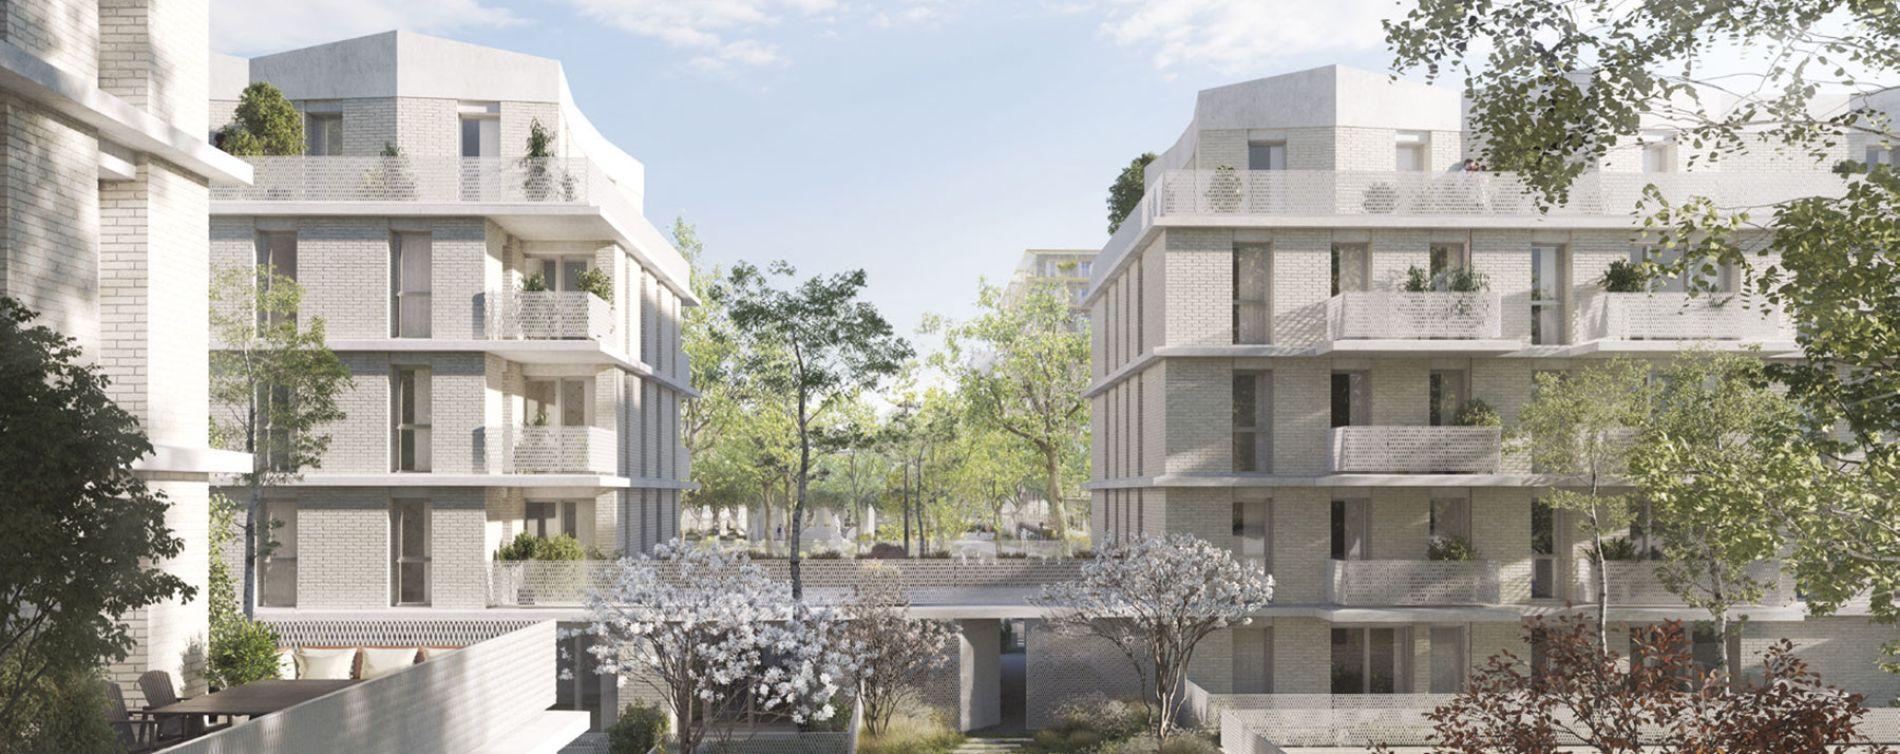 Villepinte : programme immobilier neuve « Greenwich » (2)